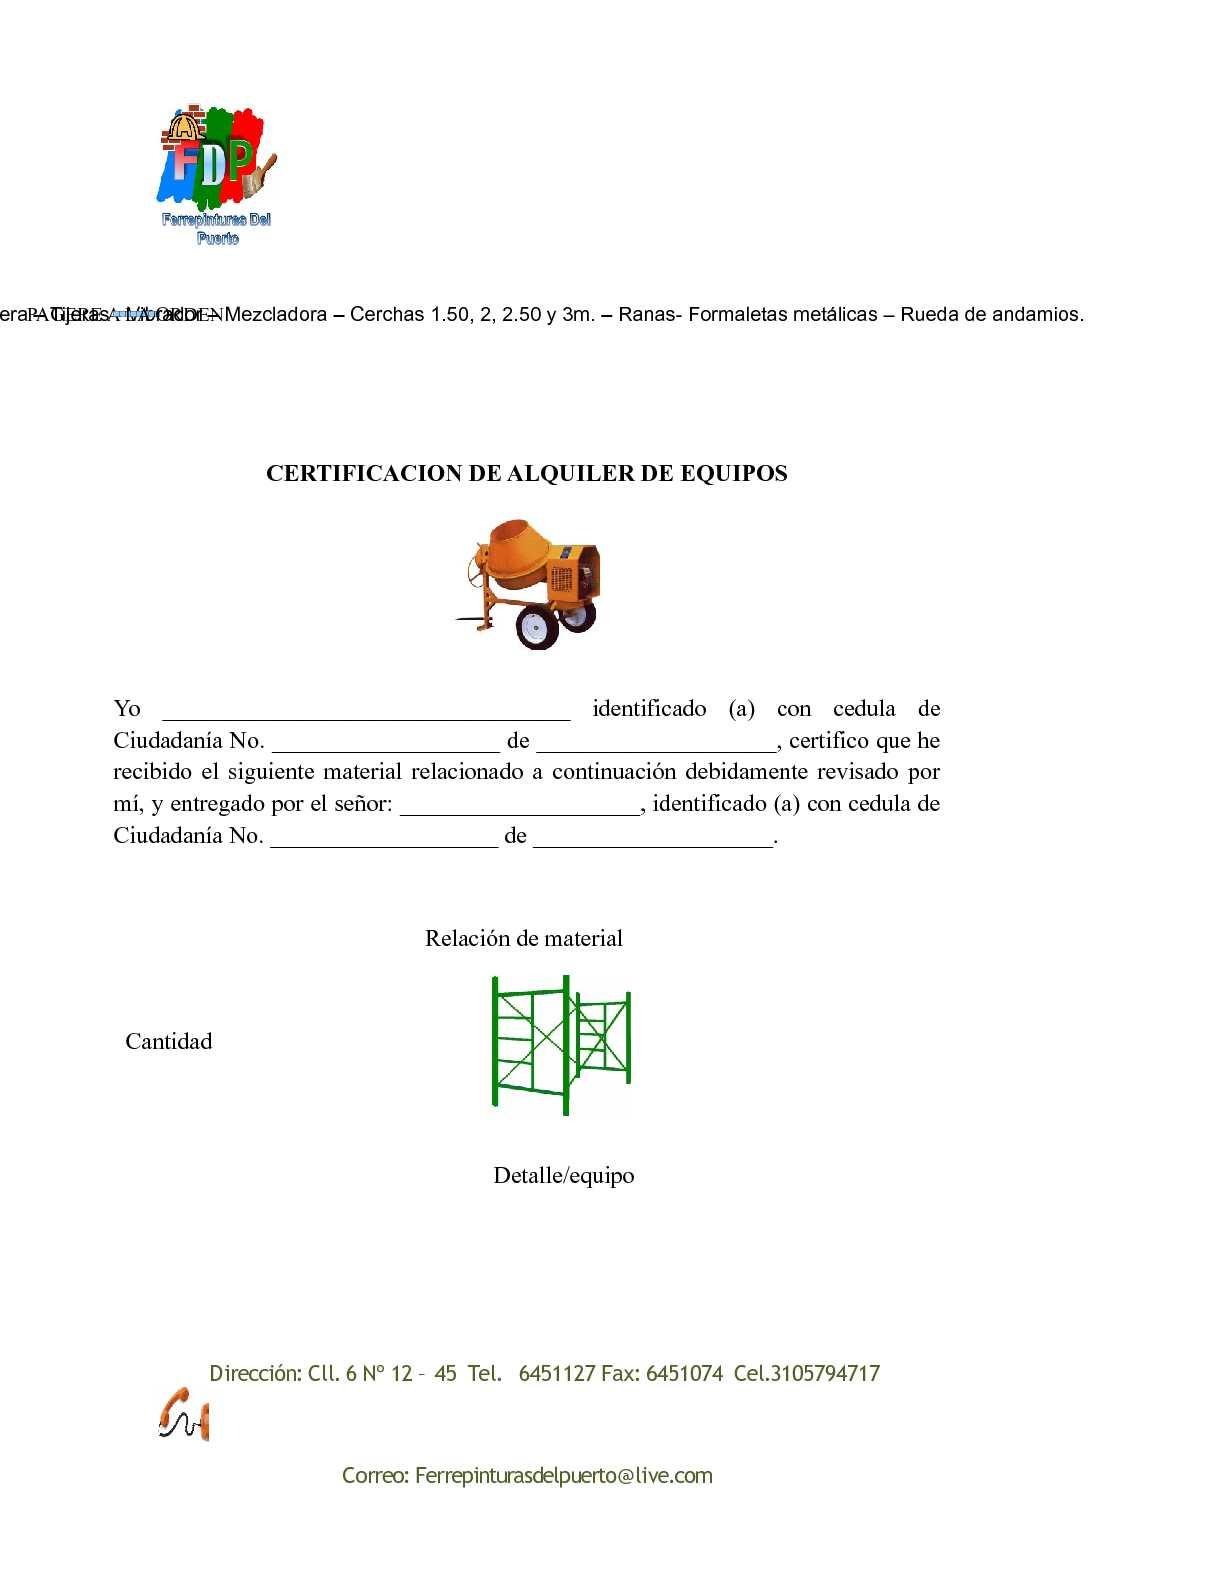 Calaméo - Formato de contratcion de alquiler de equipos